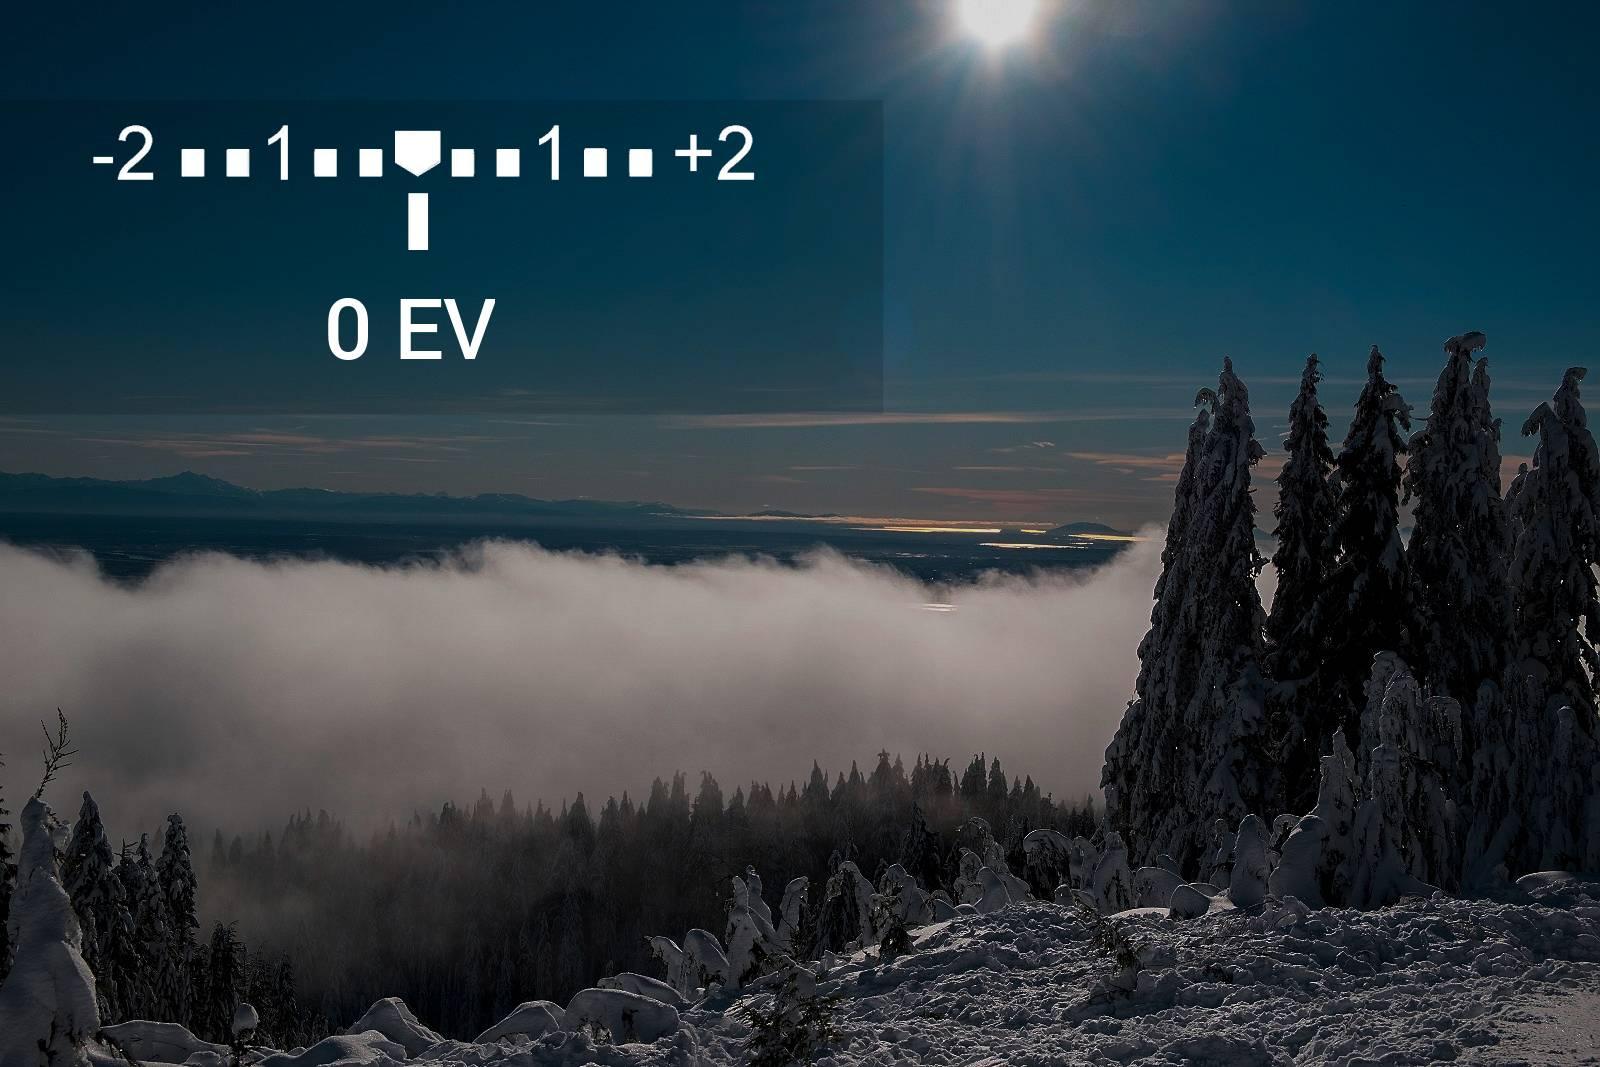 Kompenzace expozice 0EV